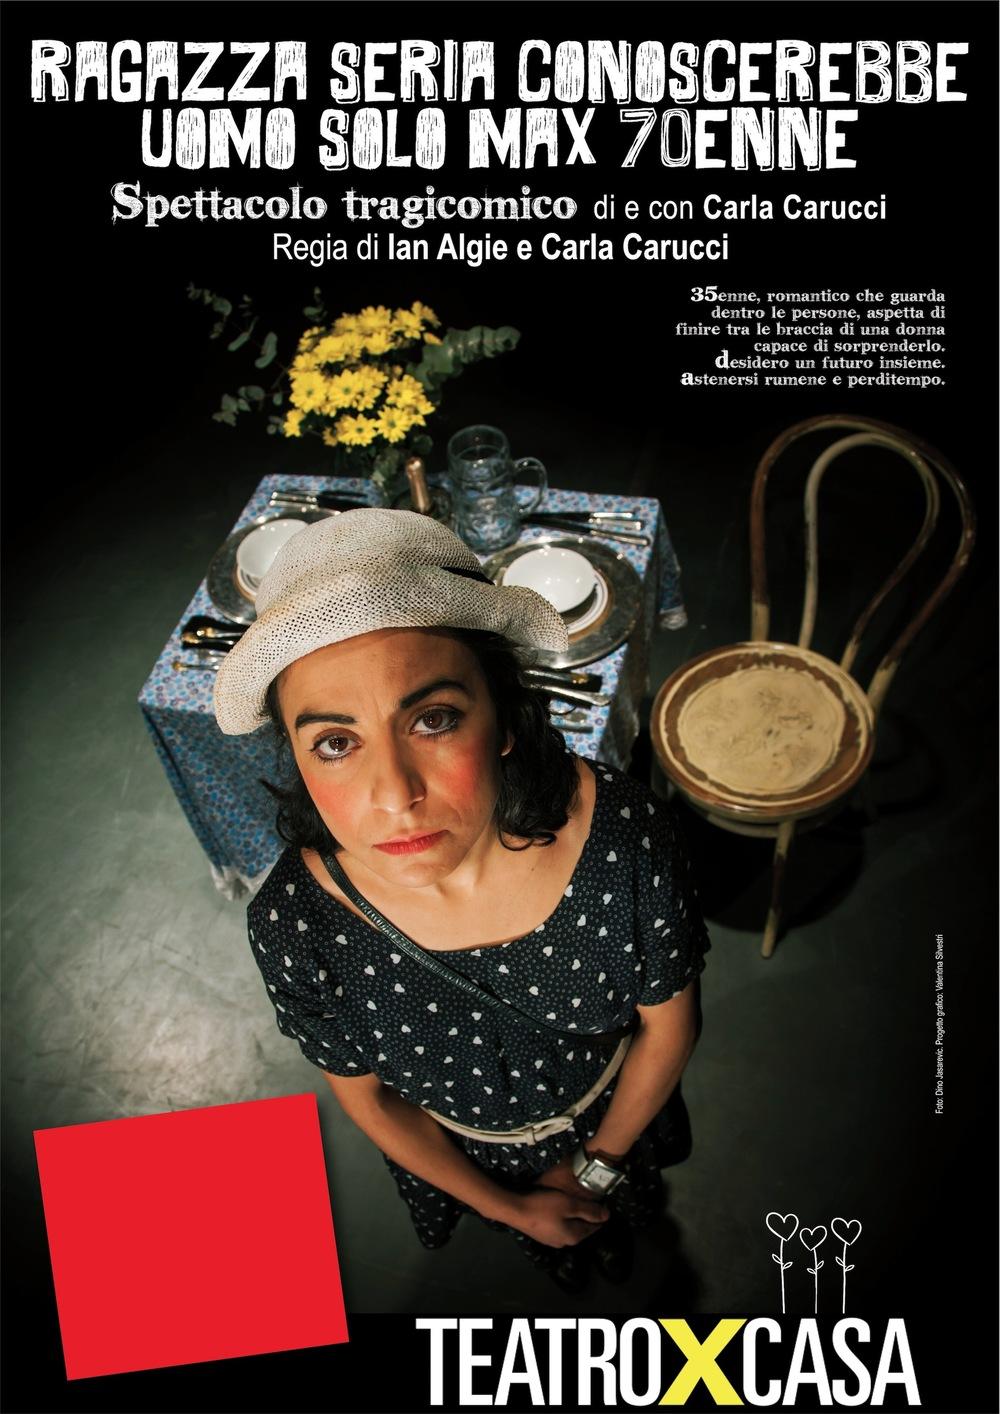 esempio locandina teatroxcasa